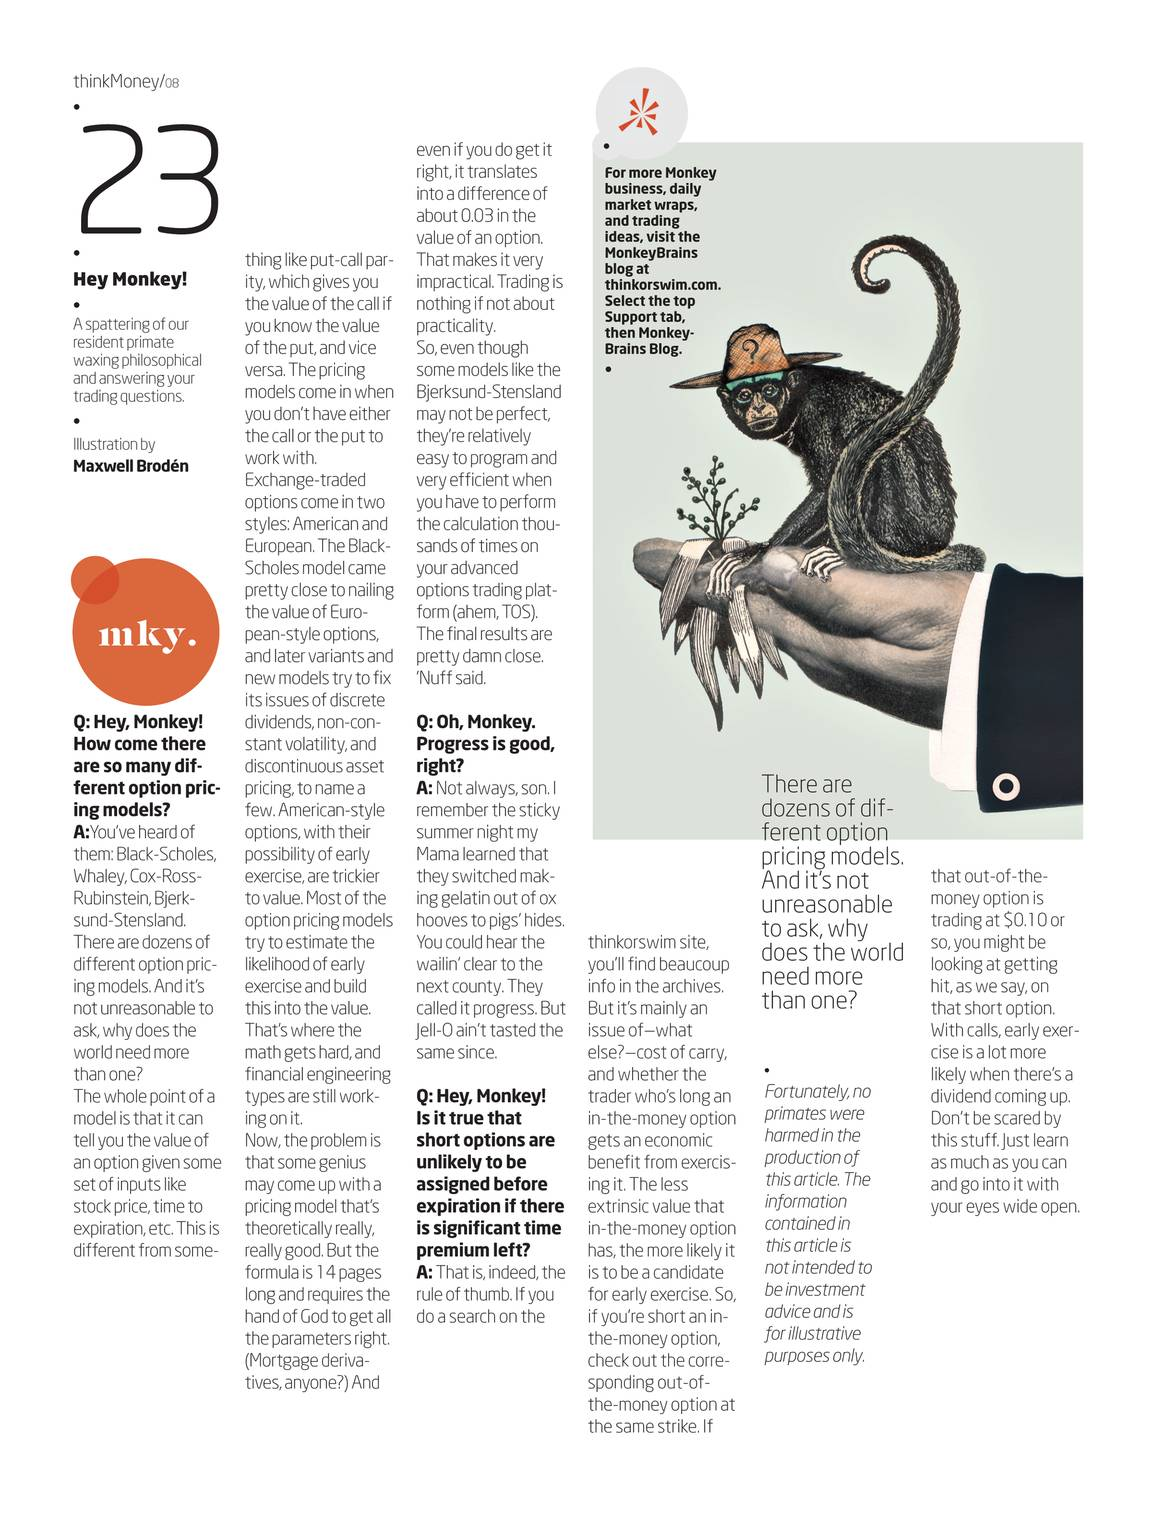 thinkMoney - Winter 2010 - page 22